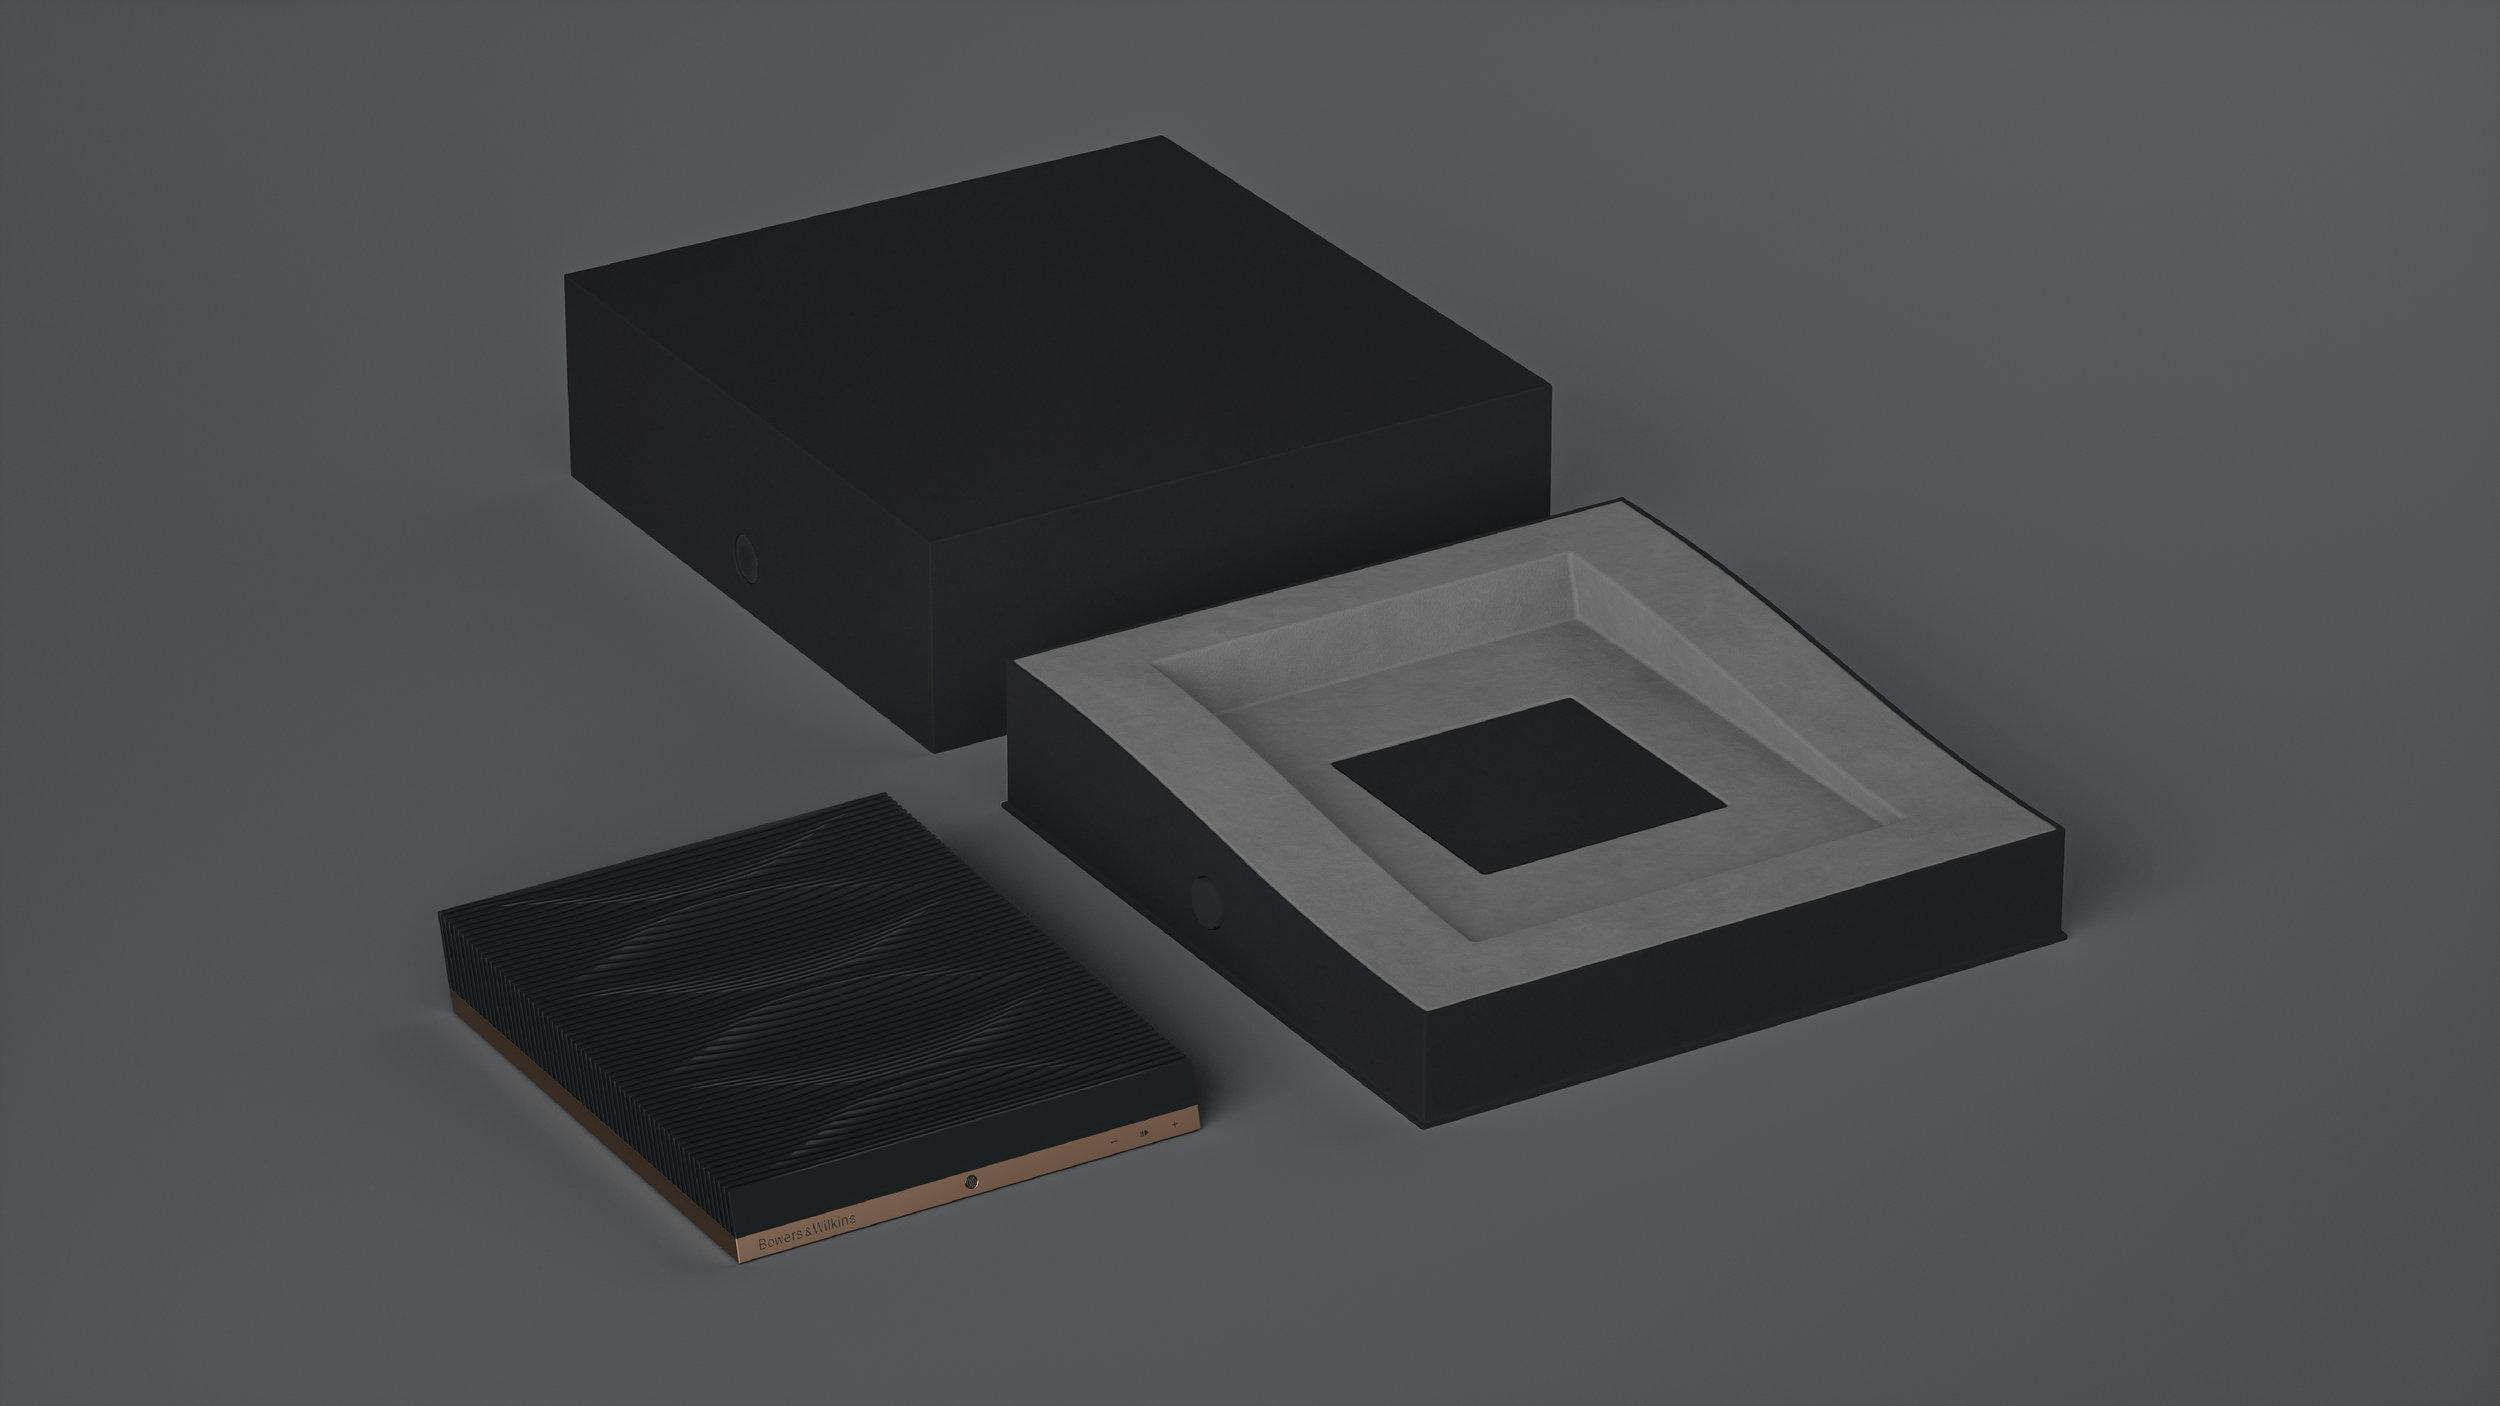 B&W_LibertySuite_PackagingStructure_R141.jpg